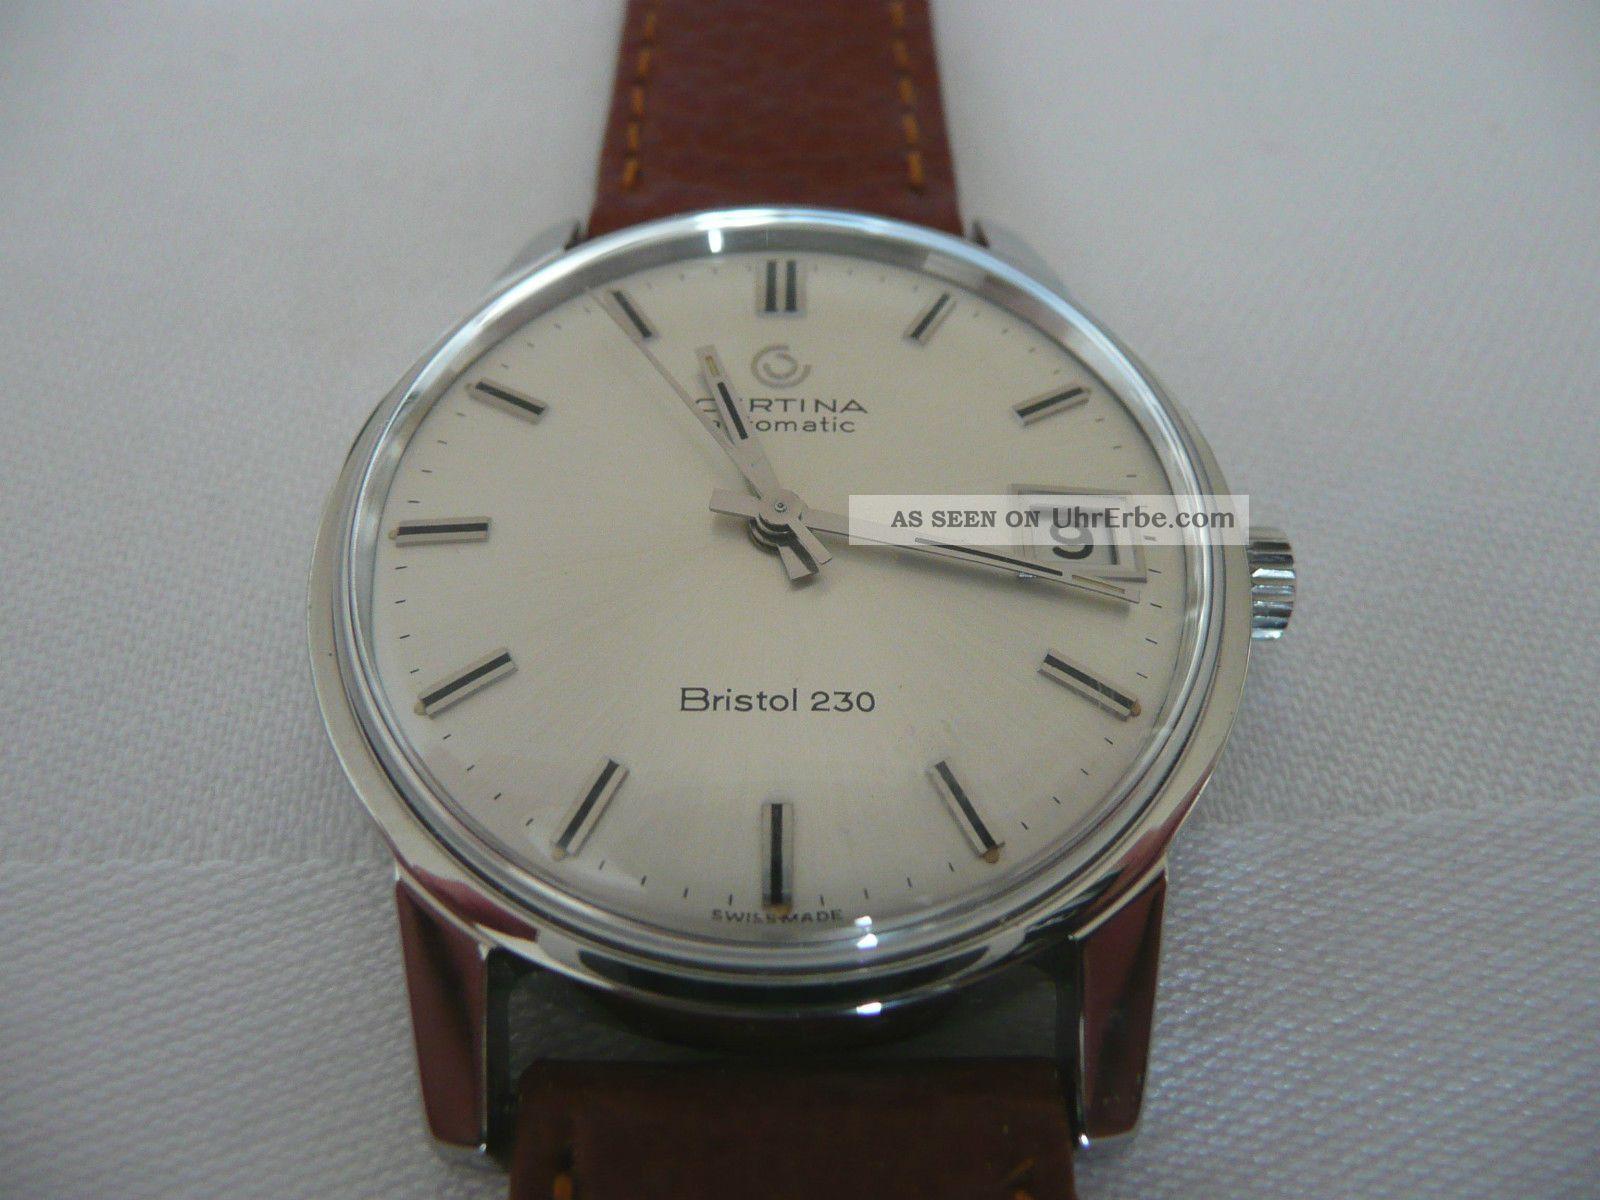 Tolle Certina Bristol 230 Automatik 60er 70er Jahre Armbanduhren Bild